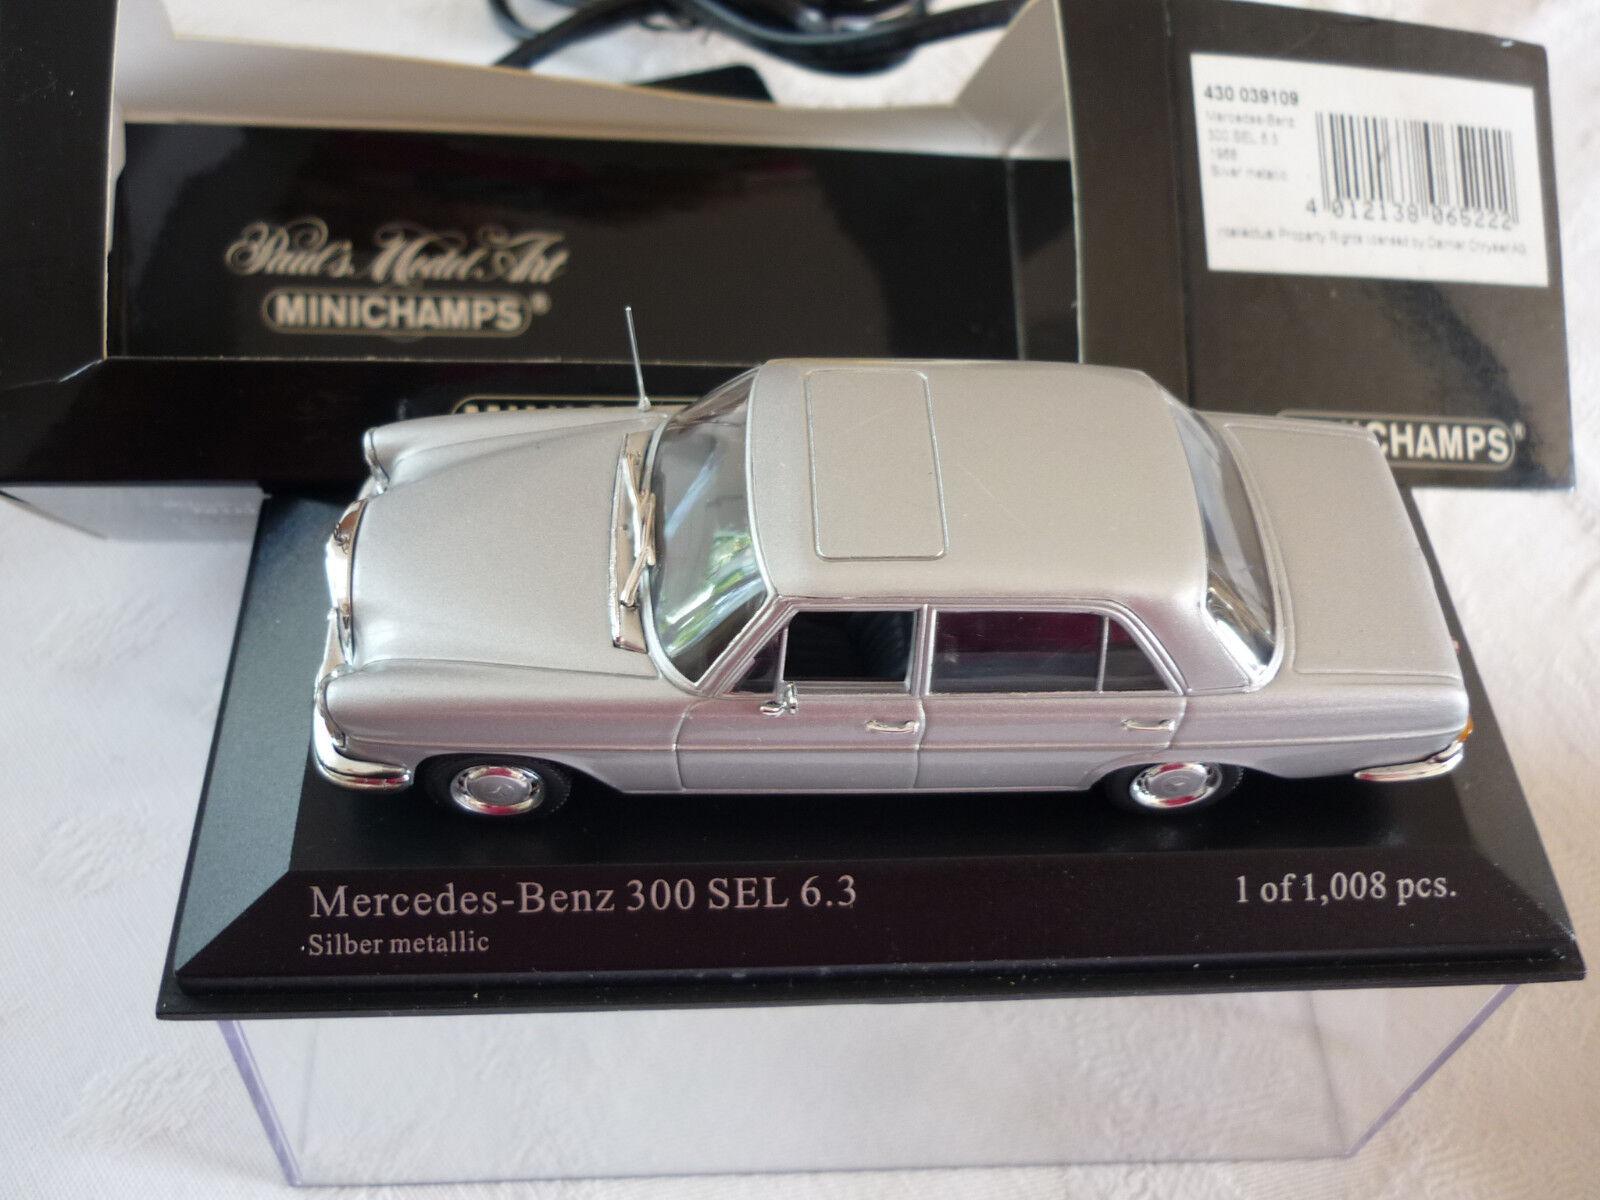 MINICHAMPS  MERCEDES  300 SEL 6.3L 1968 1 43 gris METAL REF 430039109